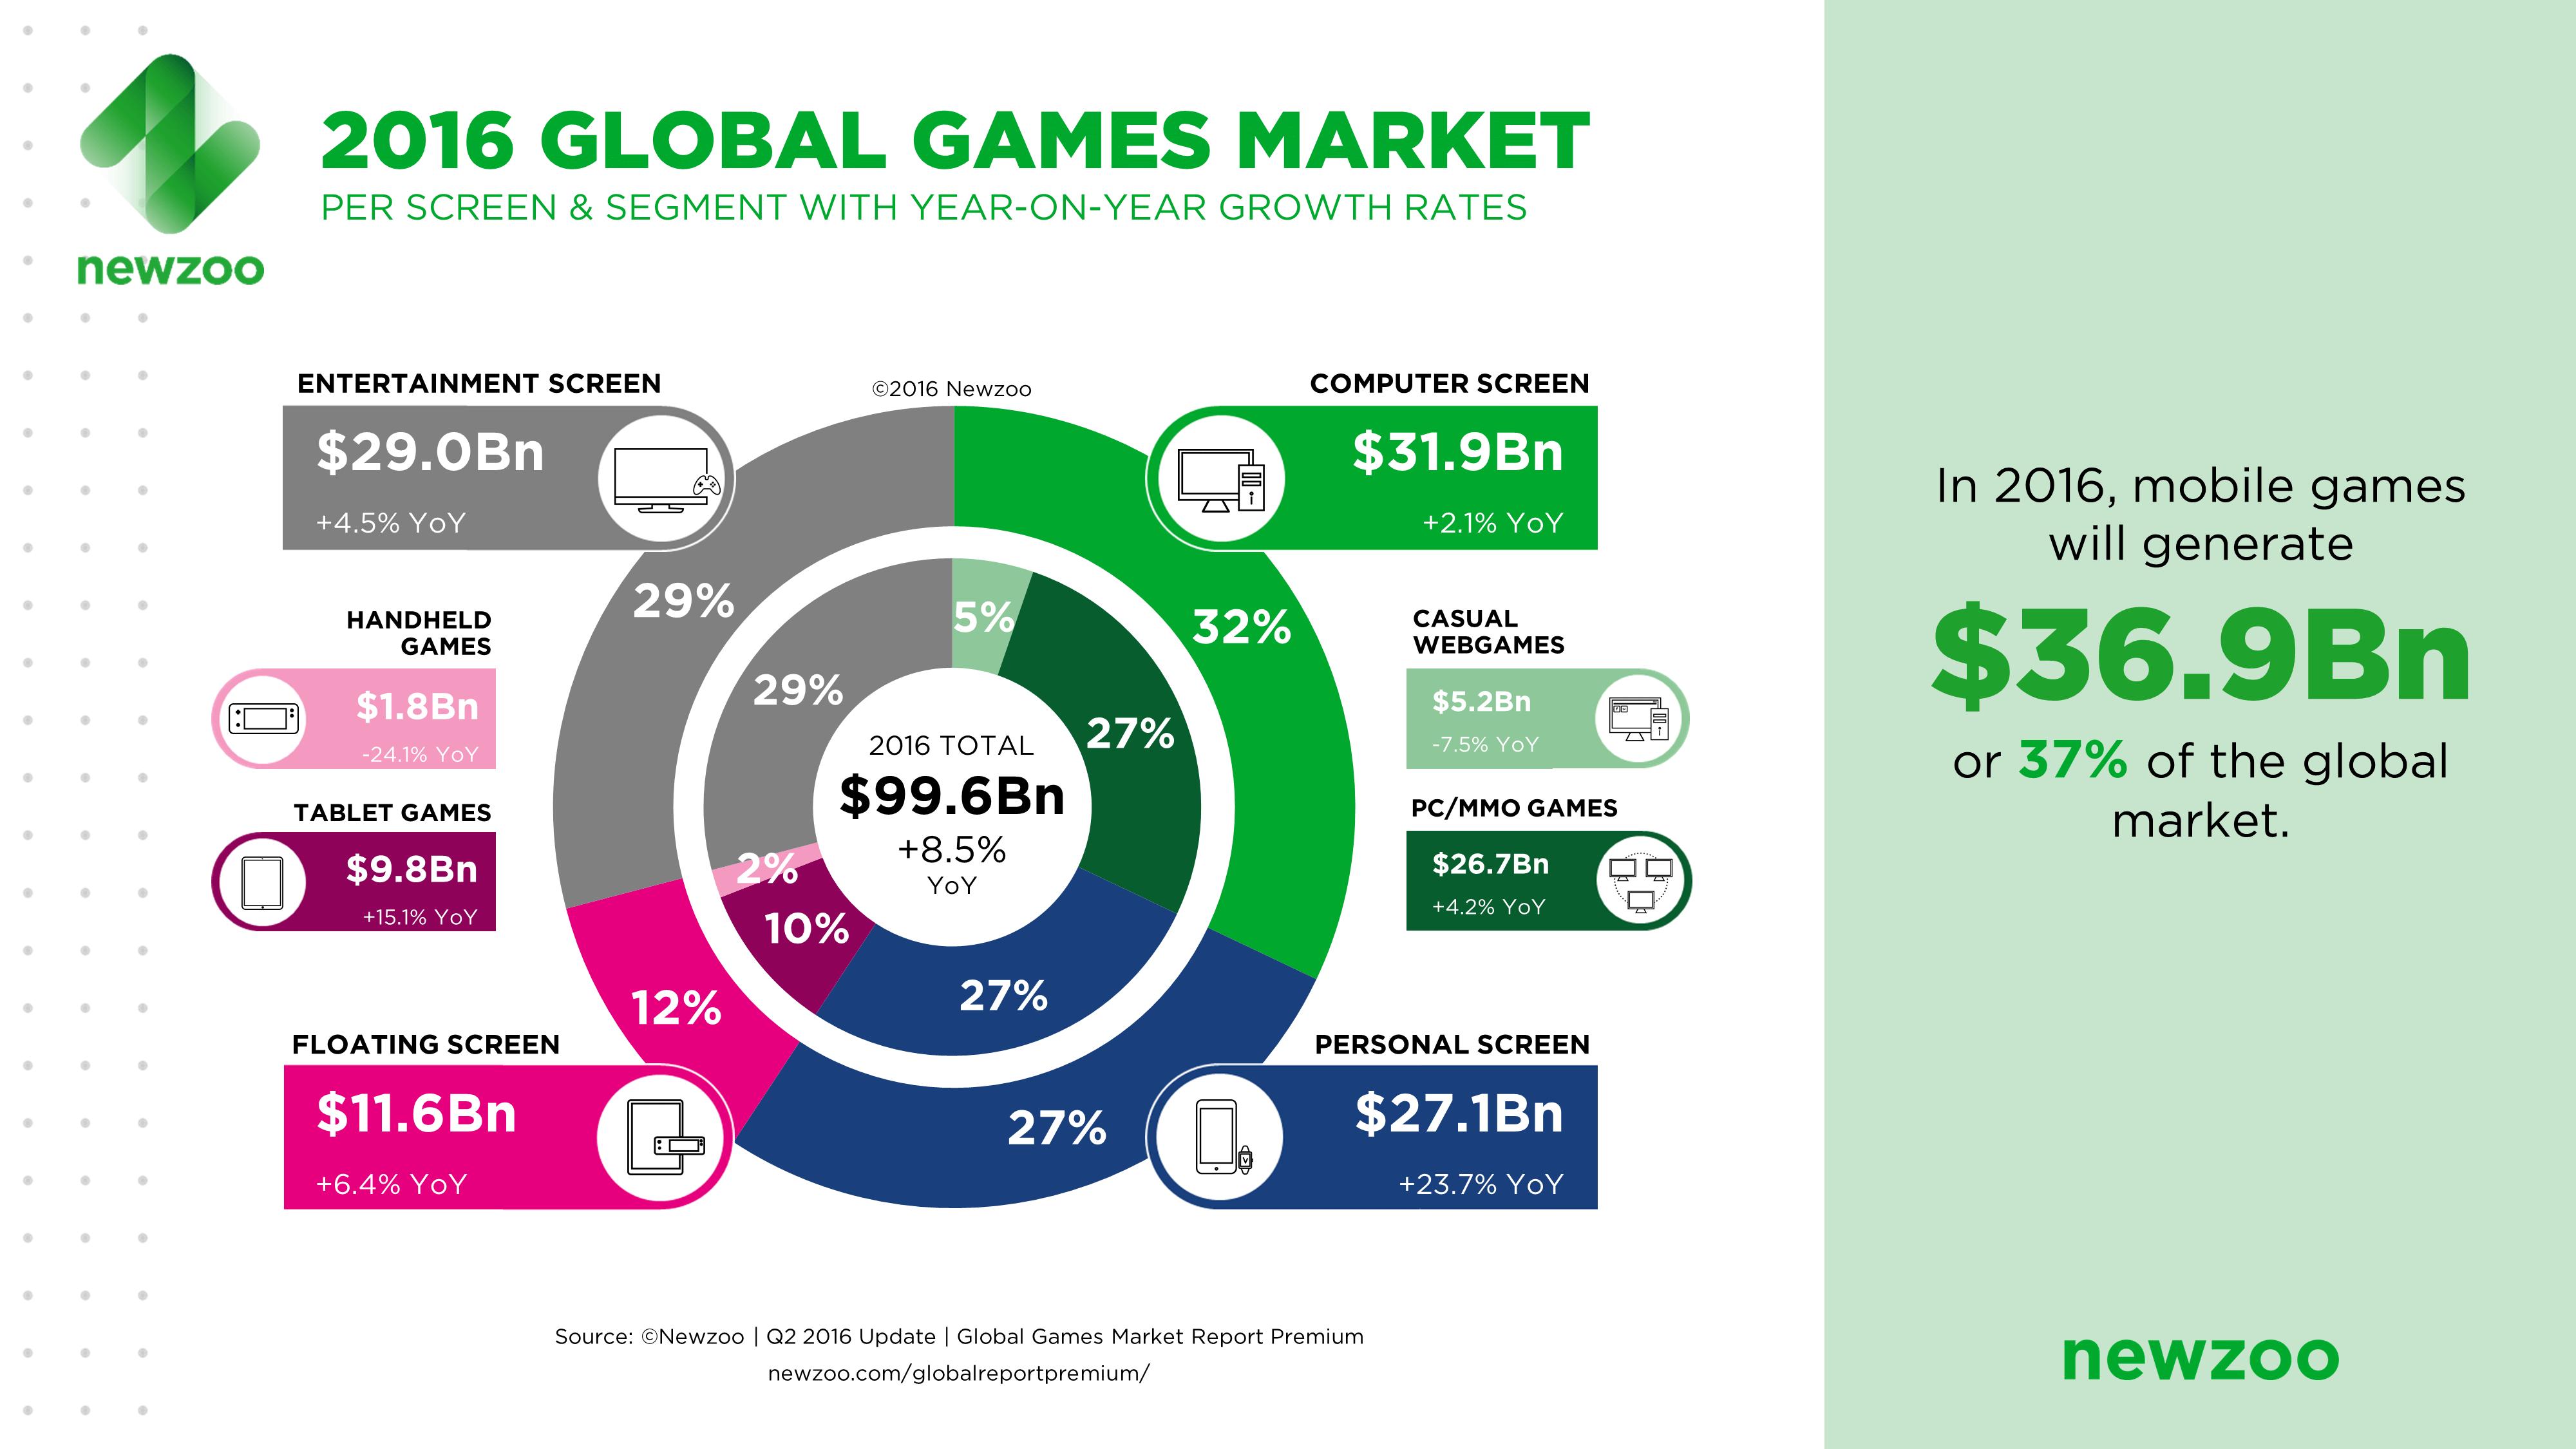 Newzoo_2016_Global_Games_Market_PerSegment_Screen-1